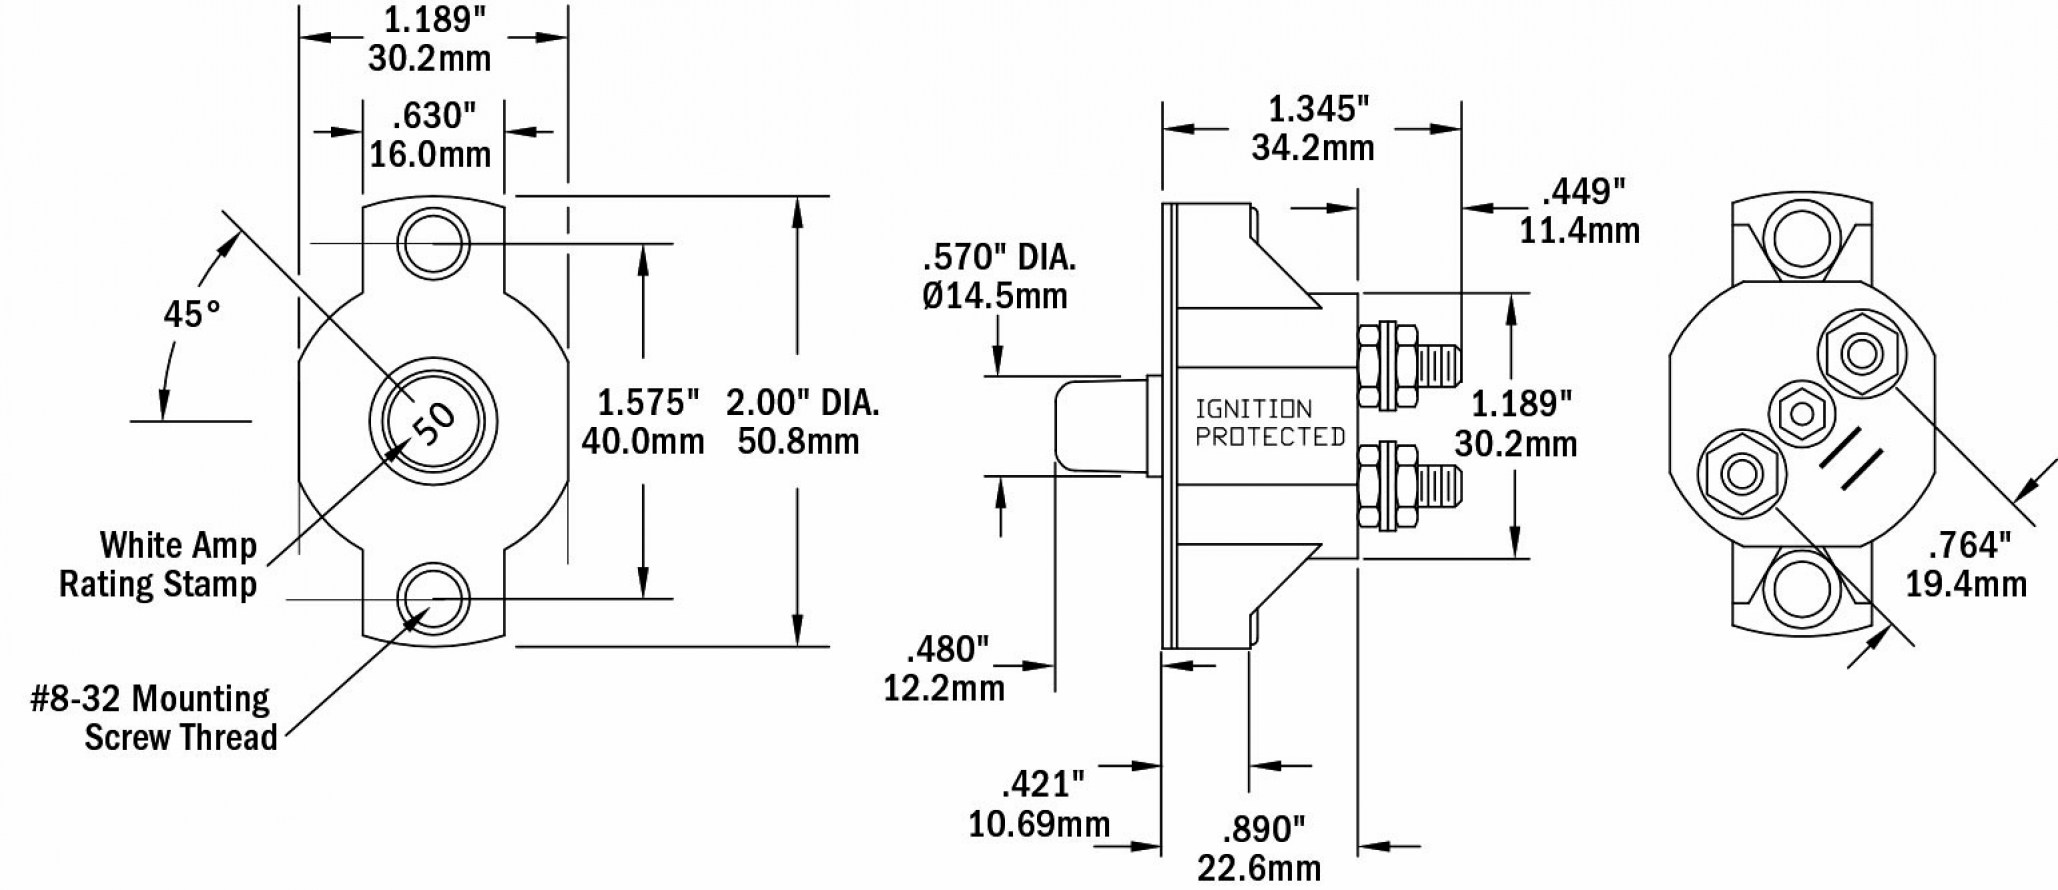 [OM_6387] Motor Plug Receptacle On Marinco Trolling Motor